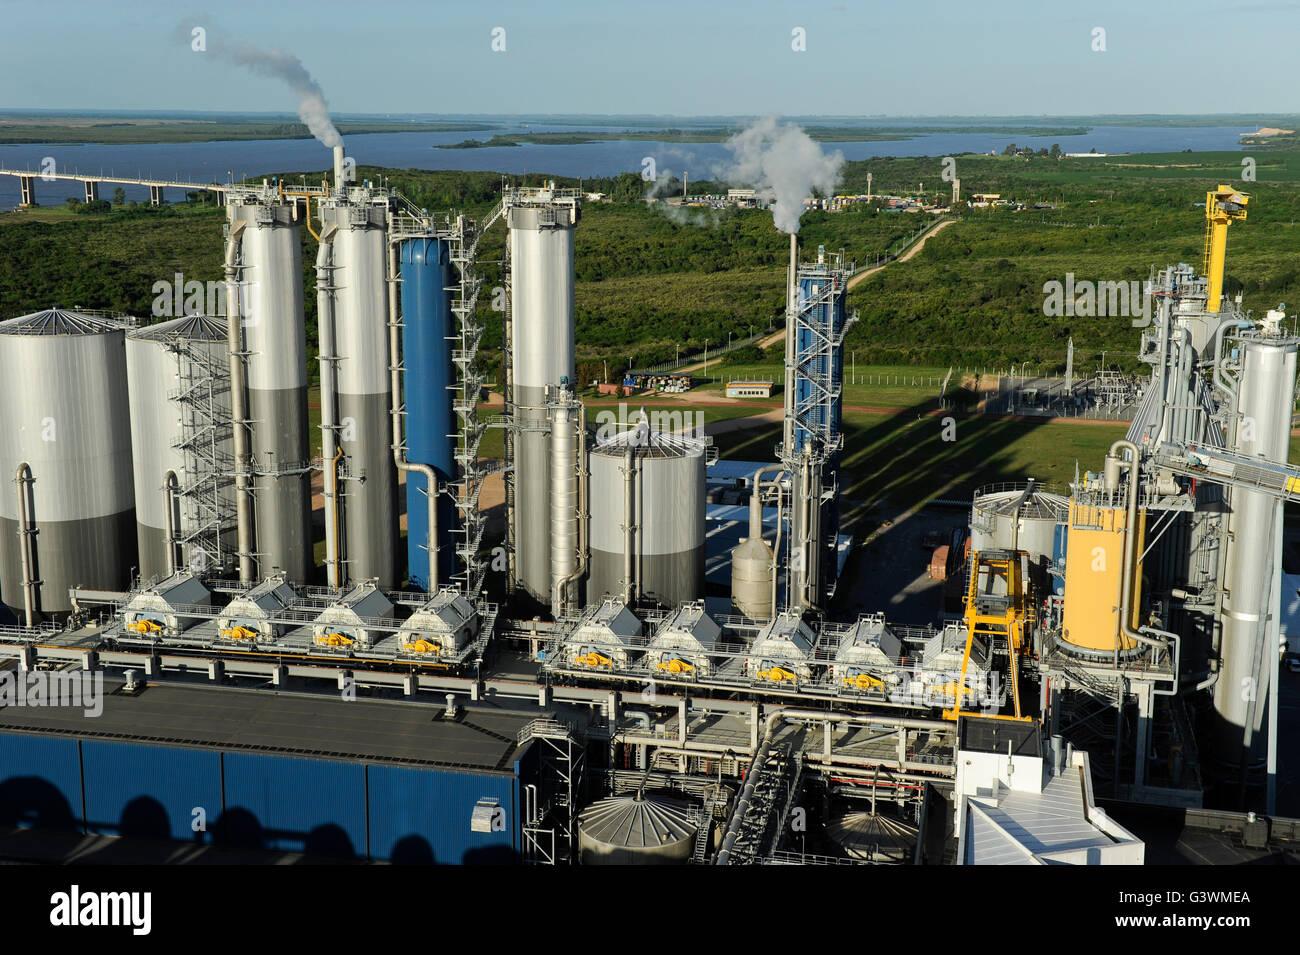 URUGUAY Fray Bentos ,  UPM pulp mill produce ECF (elemental chlorine free) pulp from FSC eucalyptus wood, Capacity, - Stock Image